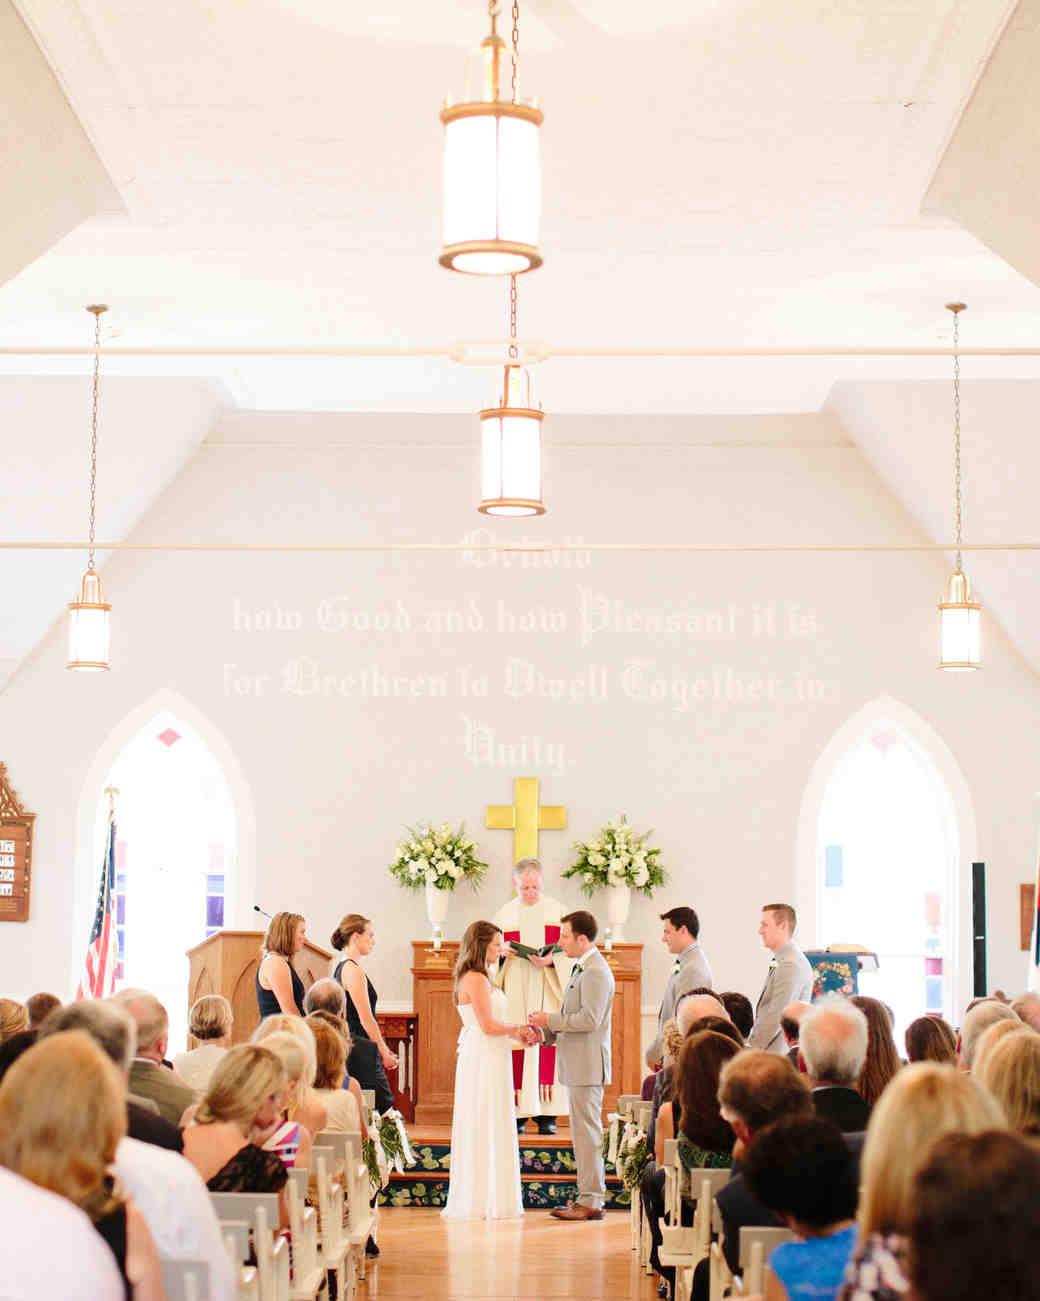 kristen-jonathan-wedding-ceremony-0771-s112193-1015.jpg